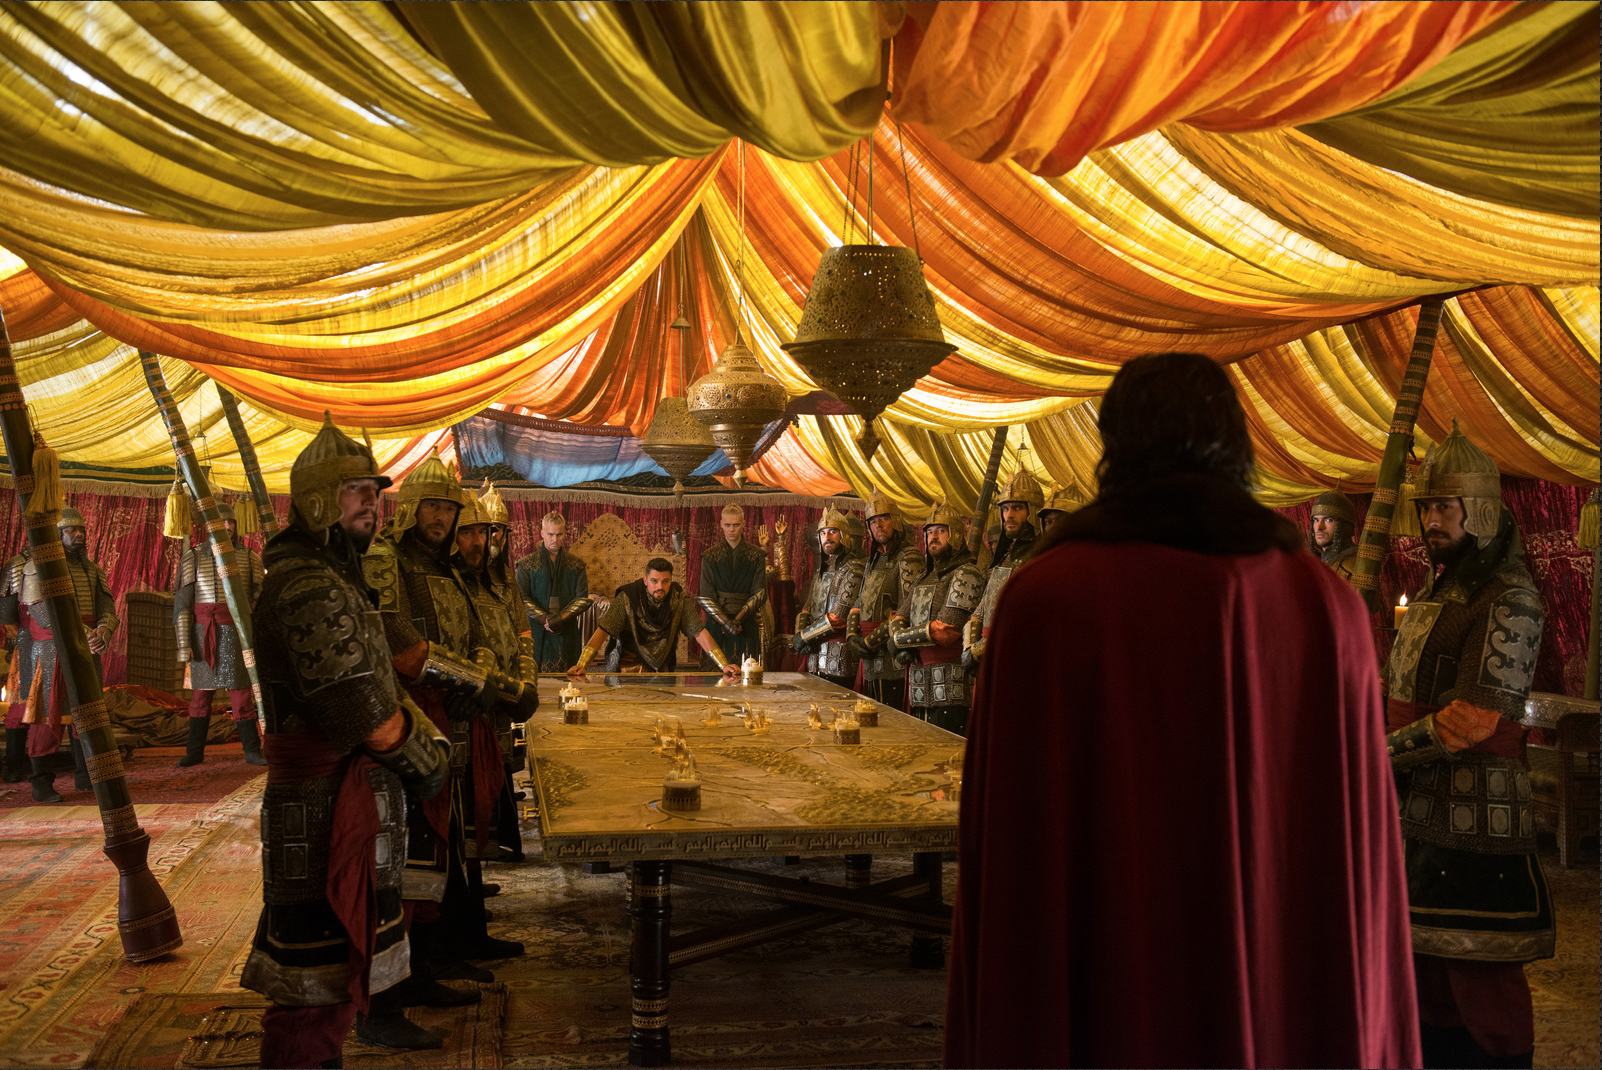 Mehmed's tent